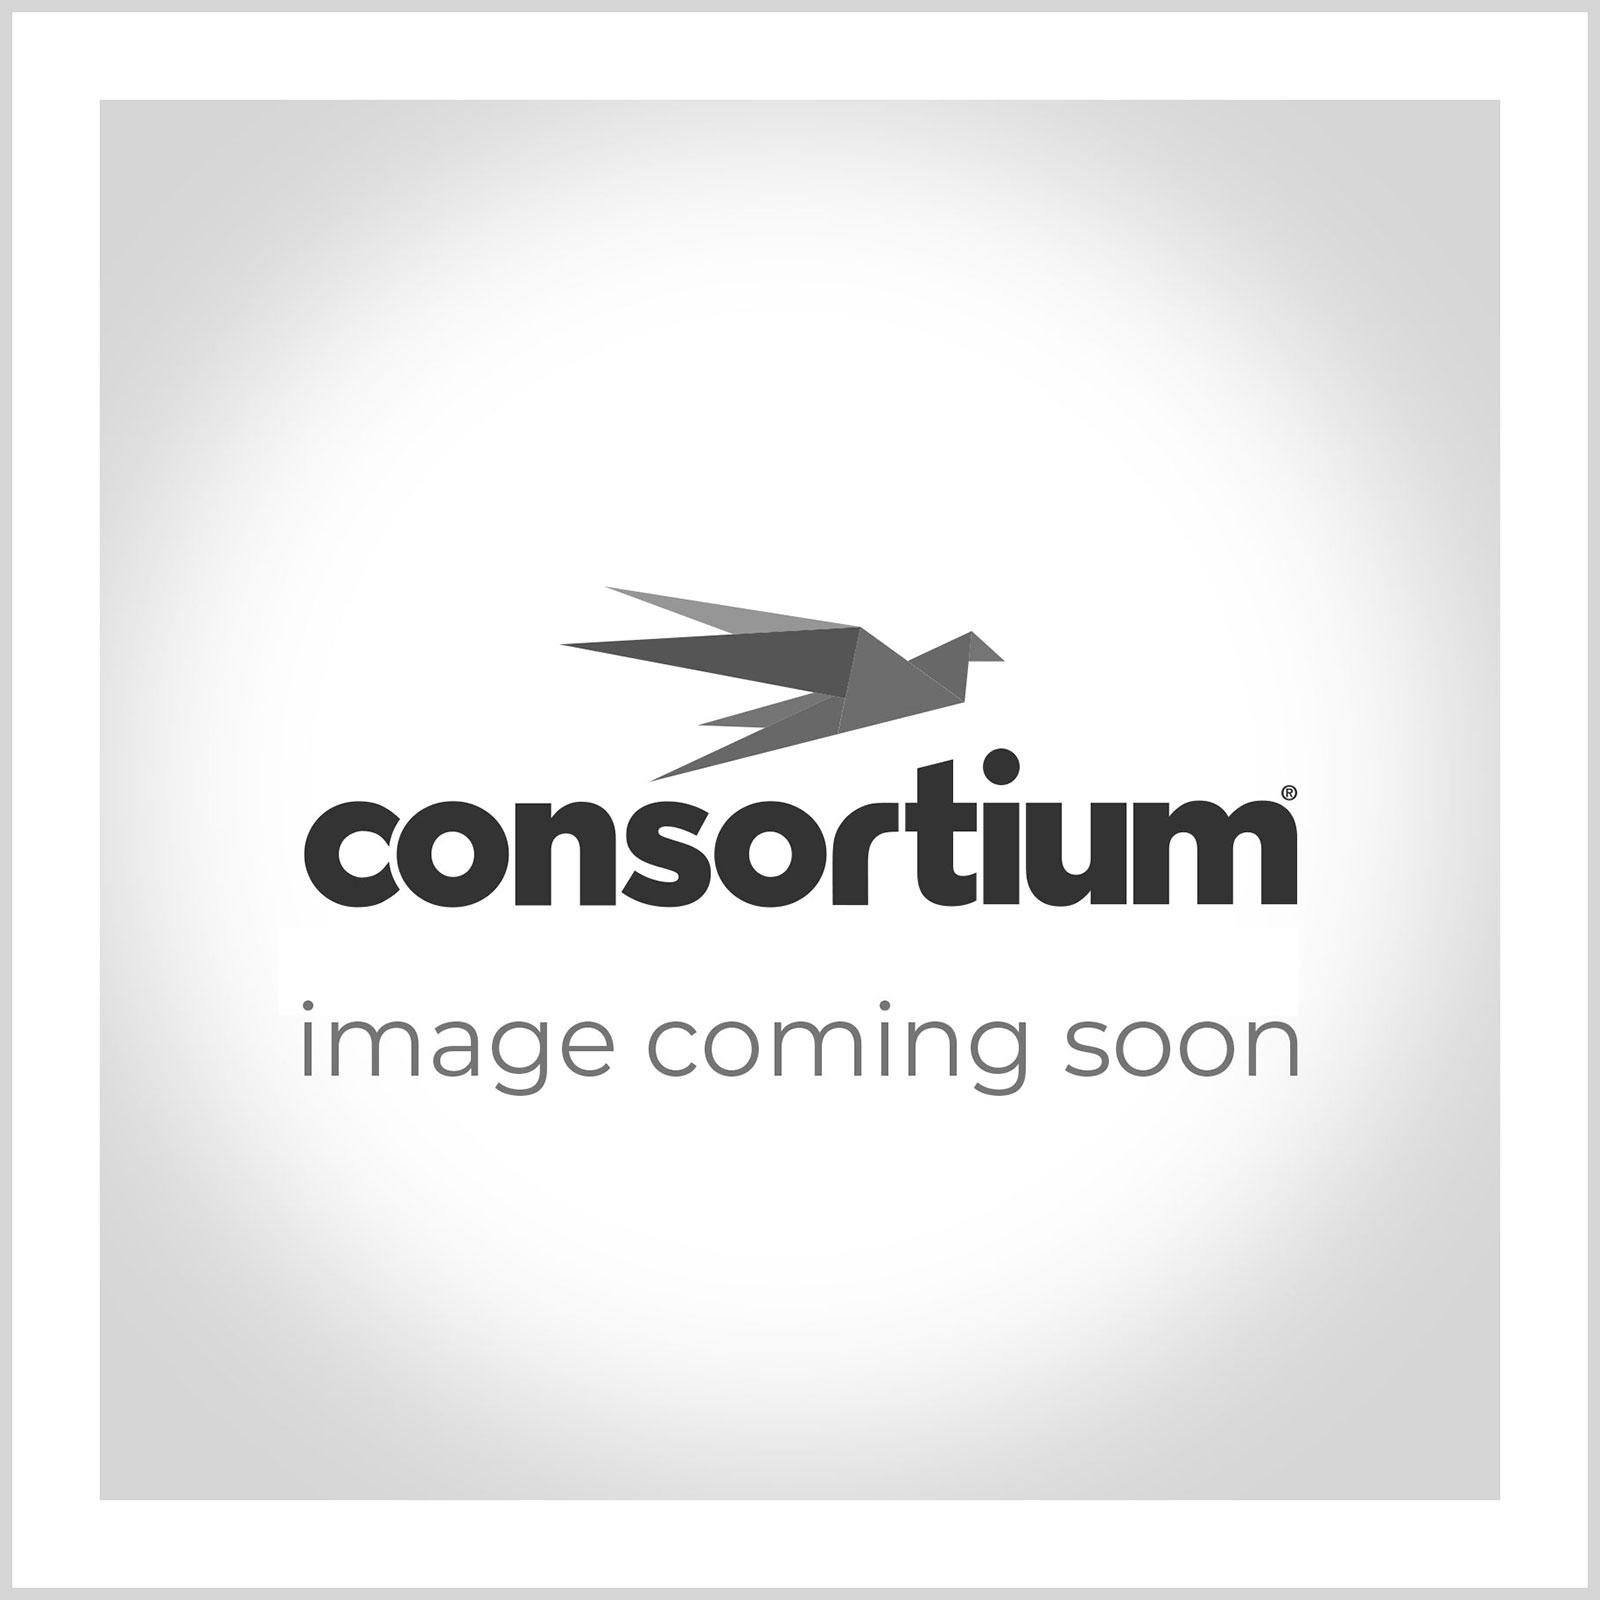 UHT Milk Cartons